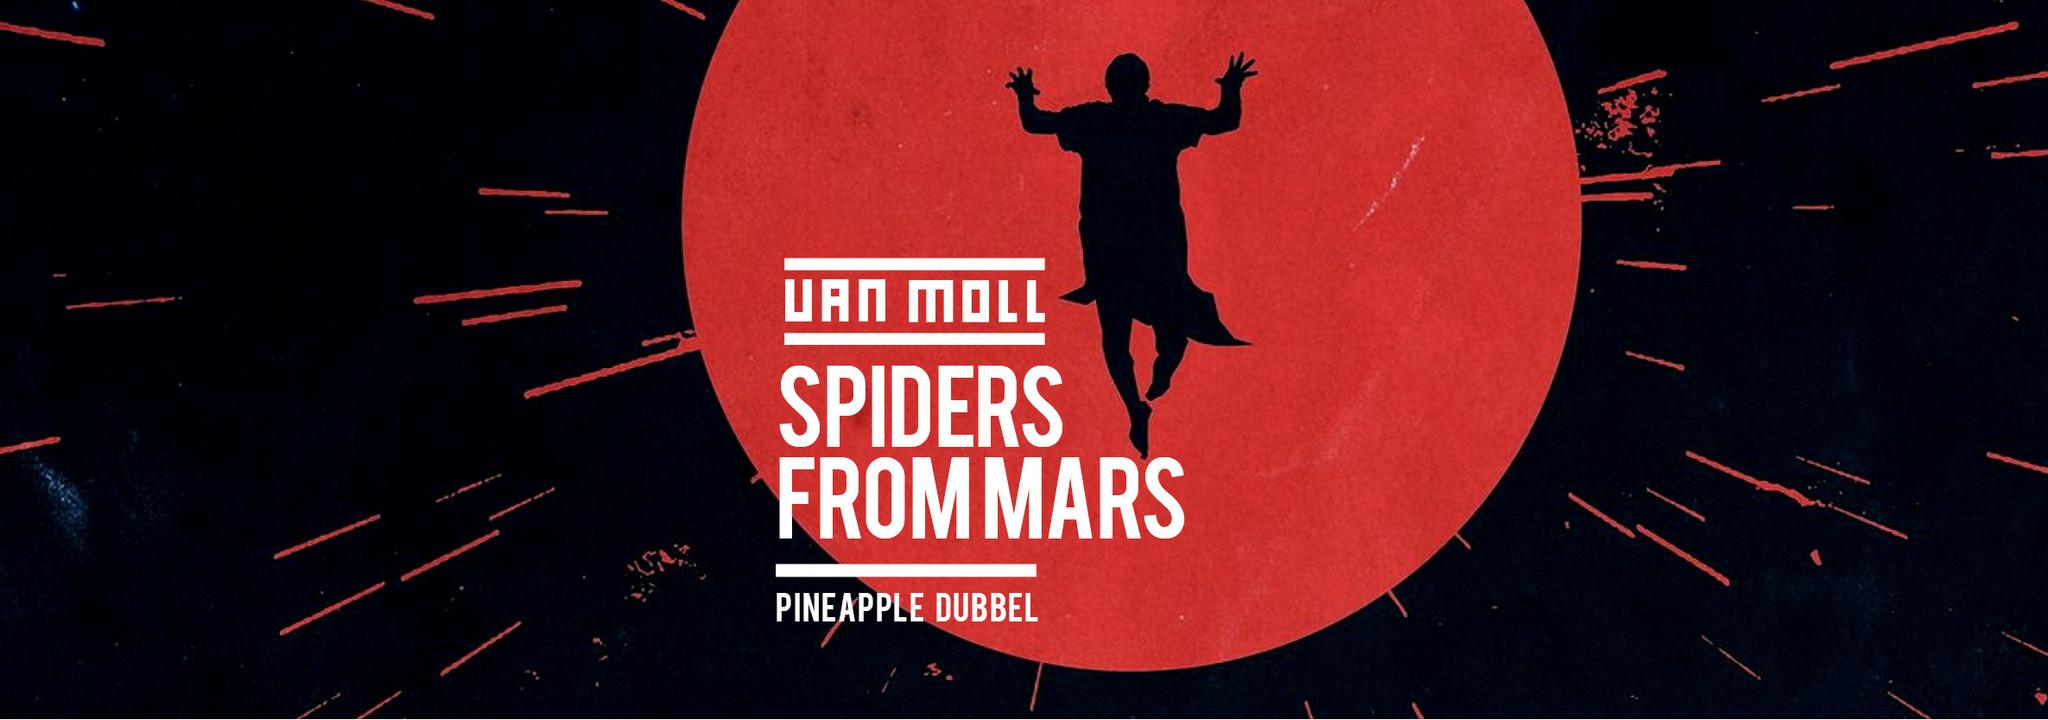 SpidersfromMars_ENG